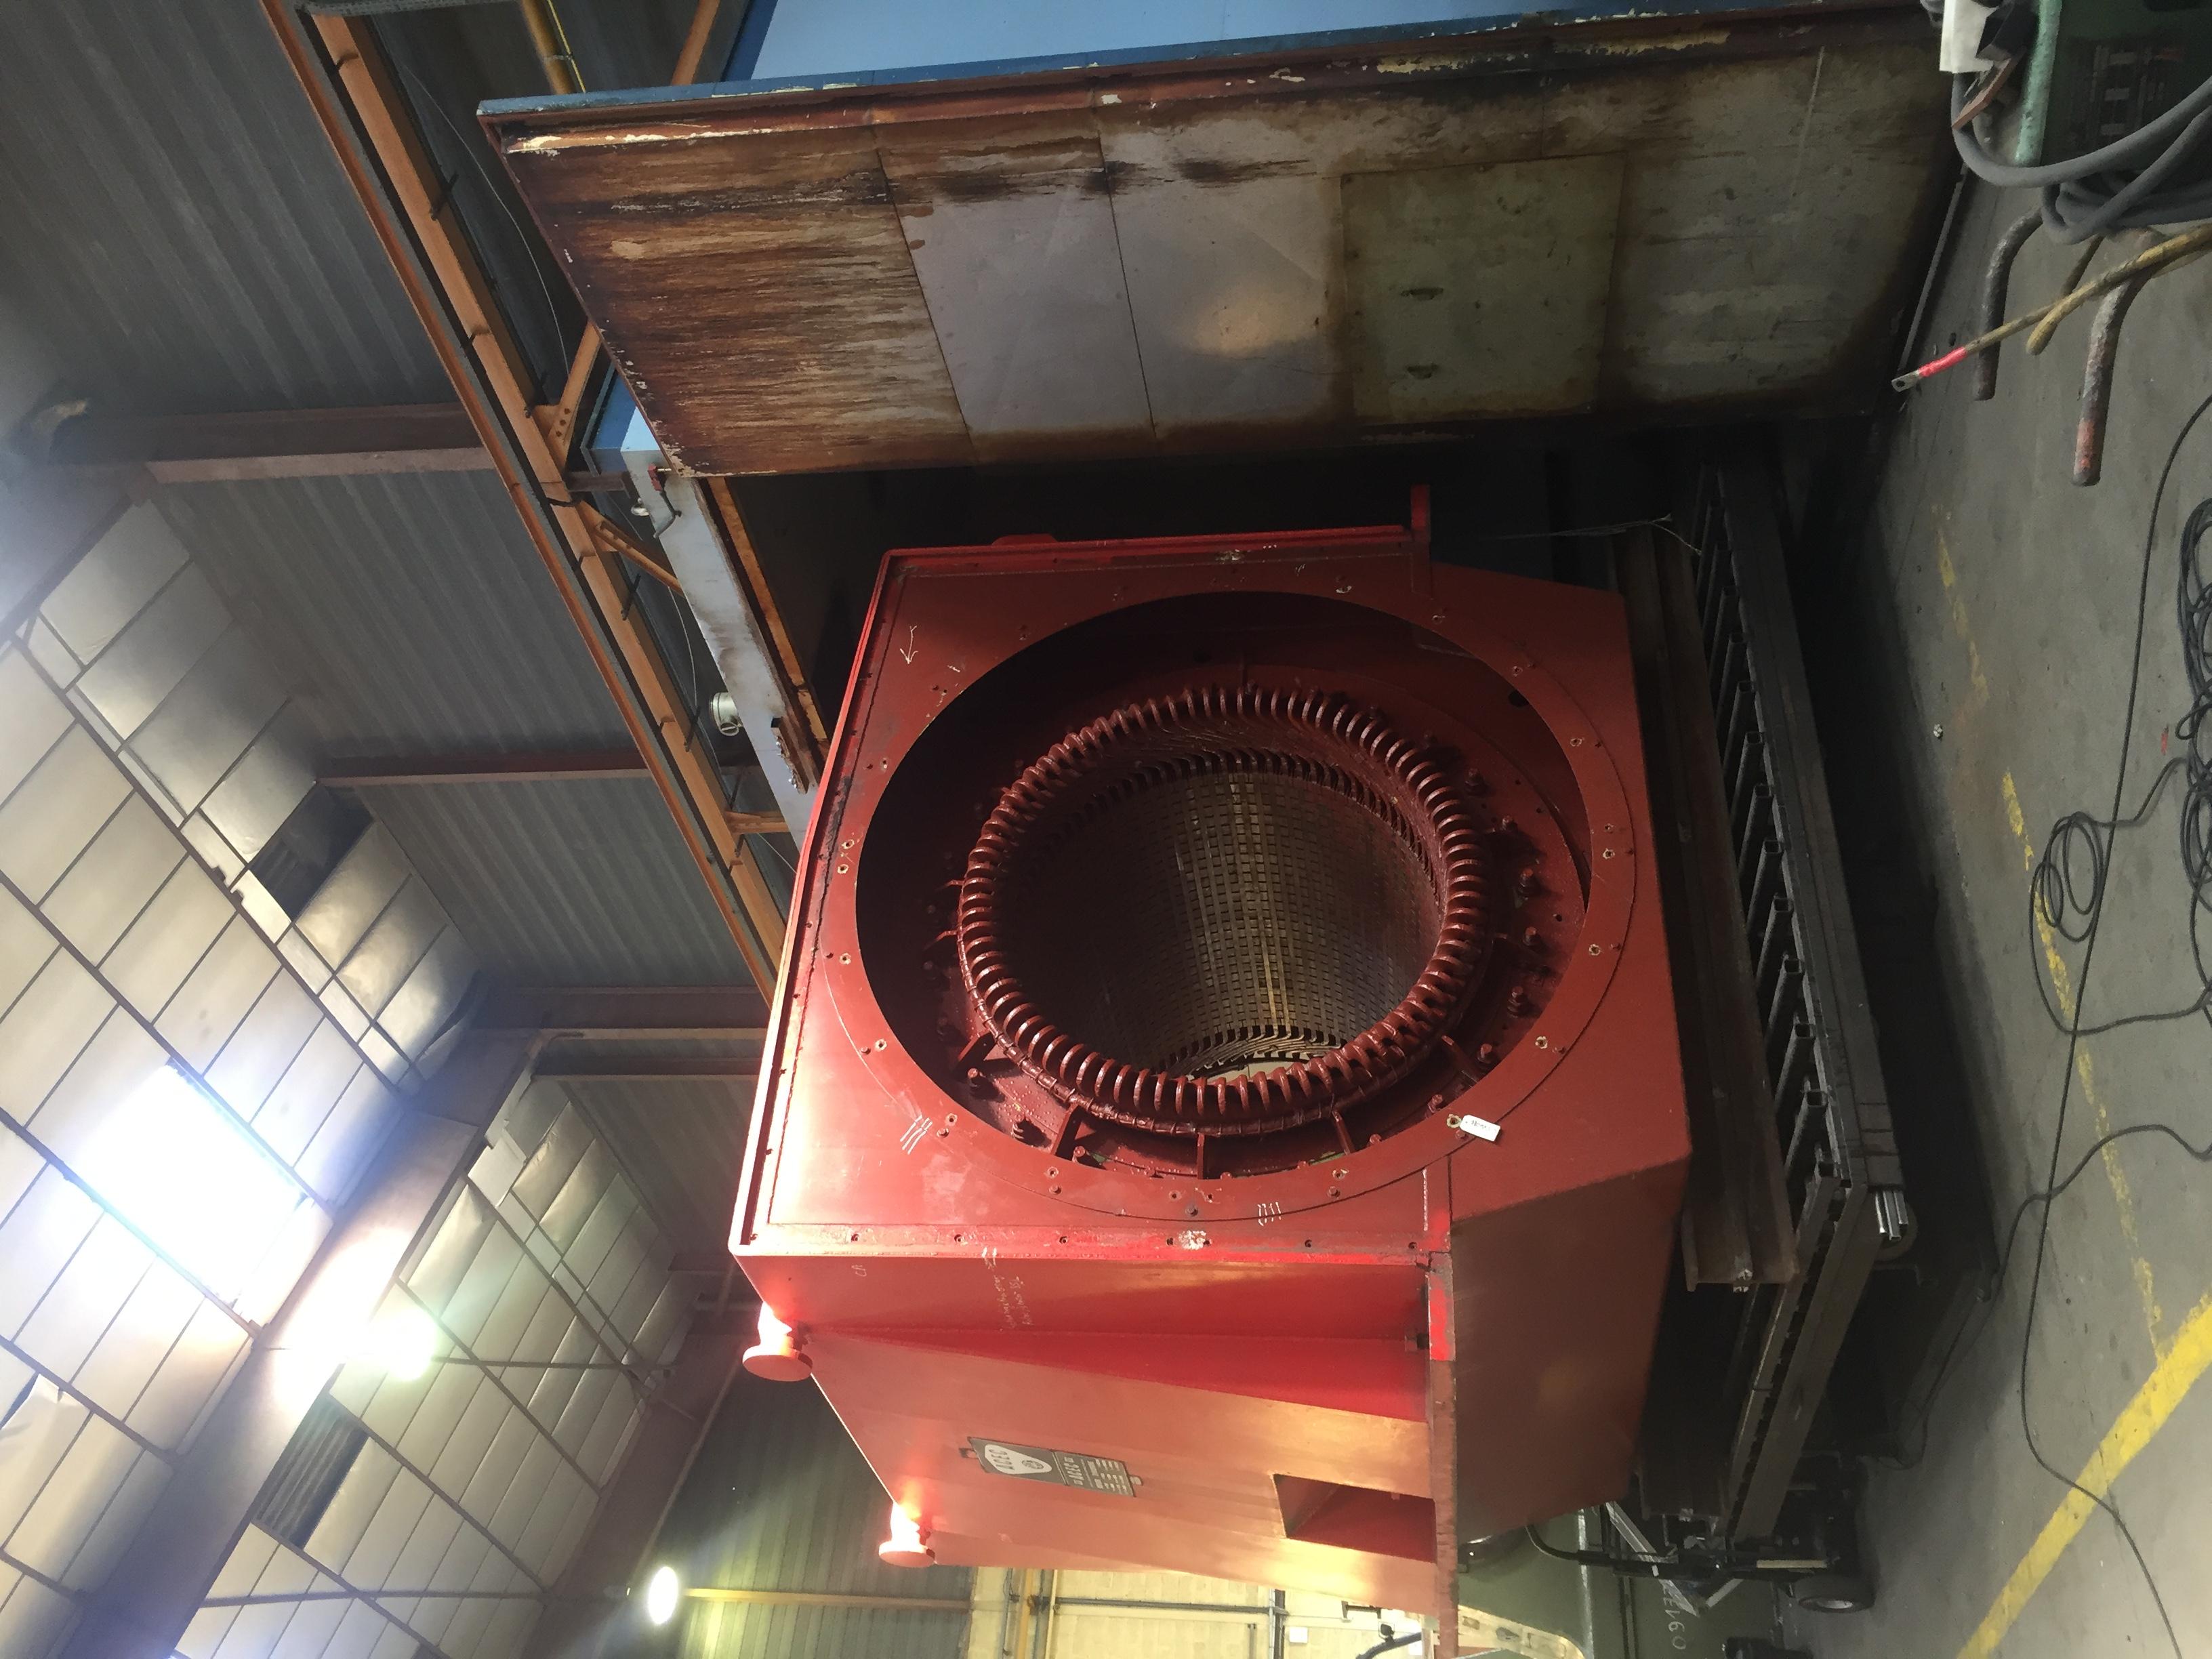 Maintenance machine tournante par Flipo Richir